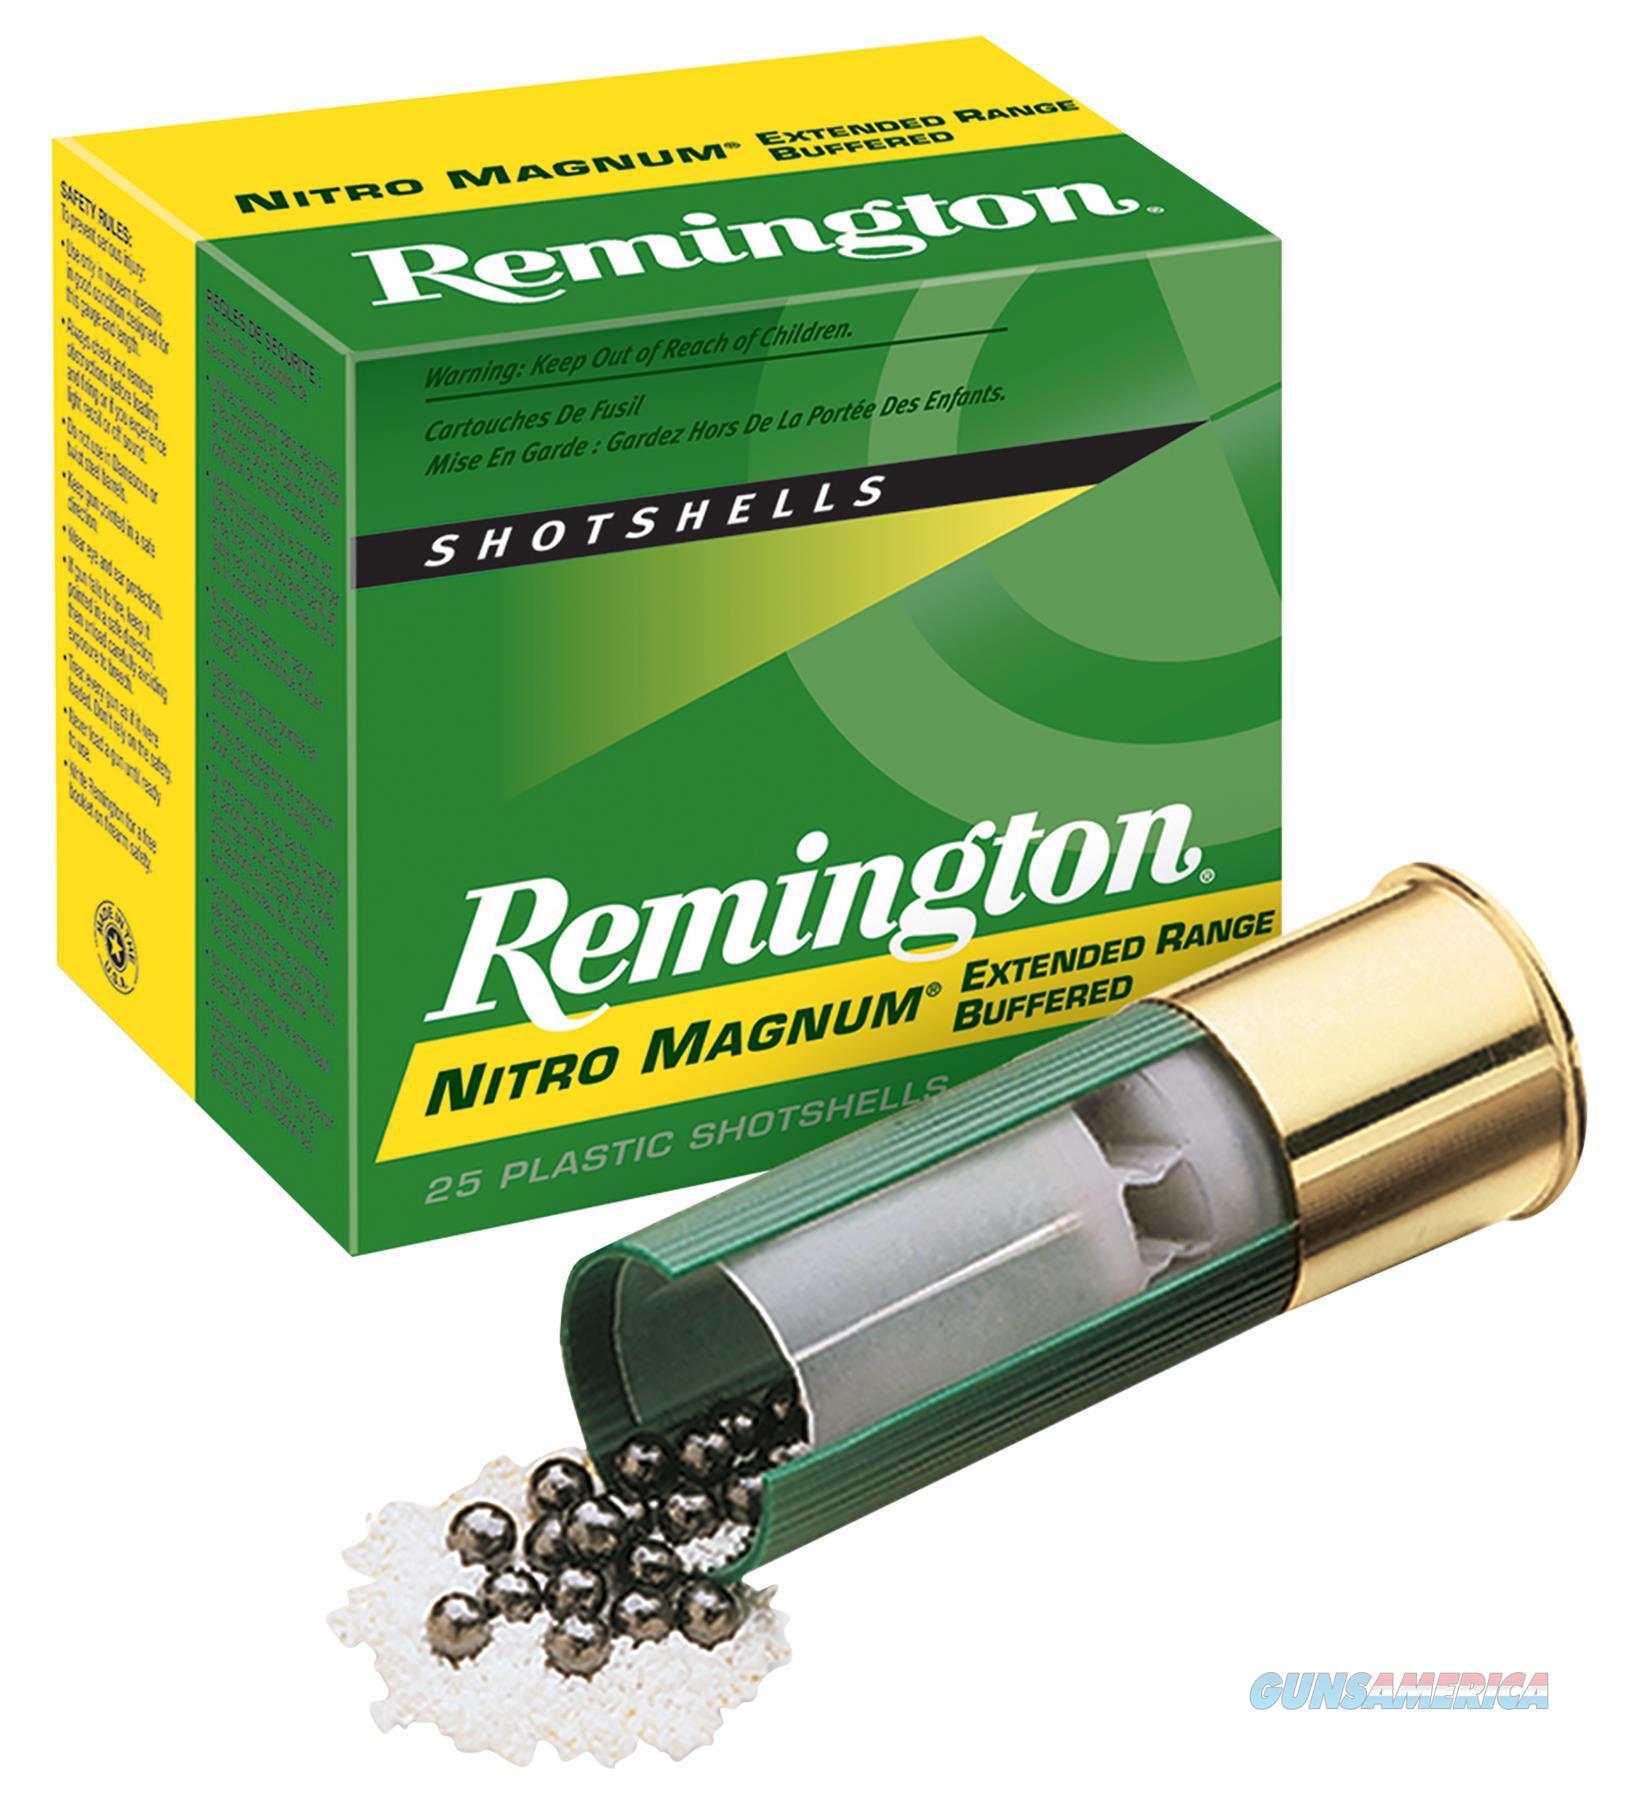 "Remington Ammunition Nm12s2 Nitro Mag Loads 12 Gauge 2.75"" 1-1/2 Oz 2 Shot 25 Bx/ 10 NM12S2  Non-Guns > Ammunition"